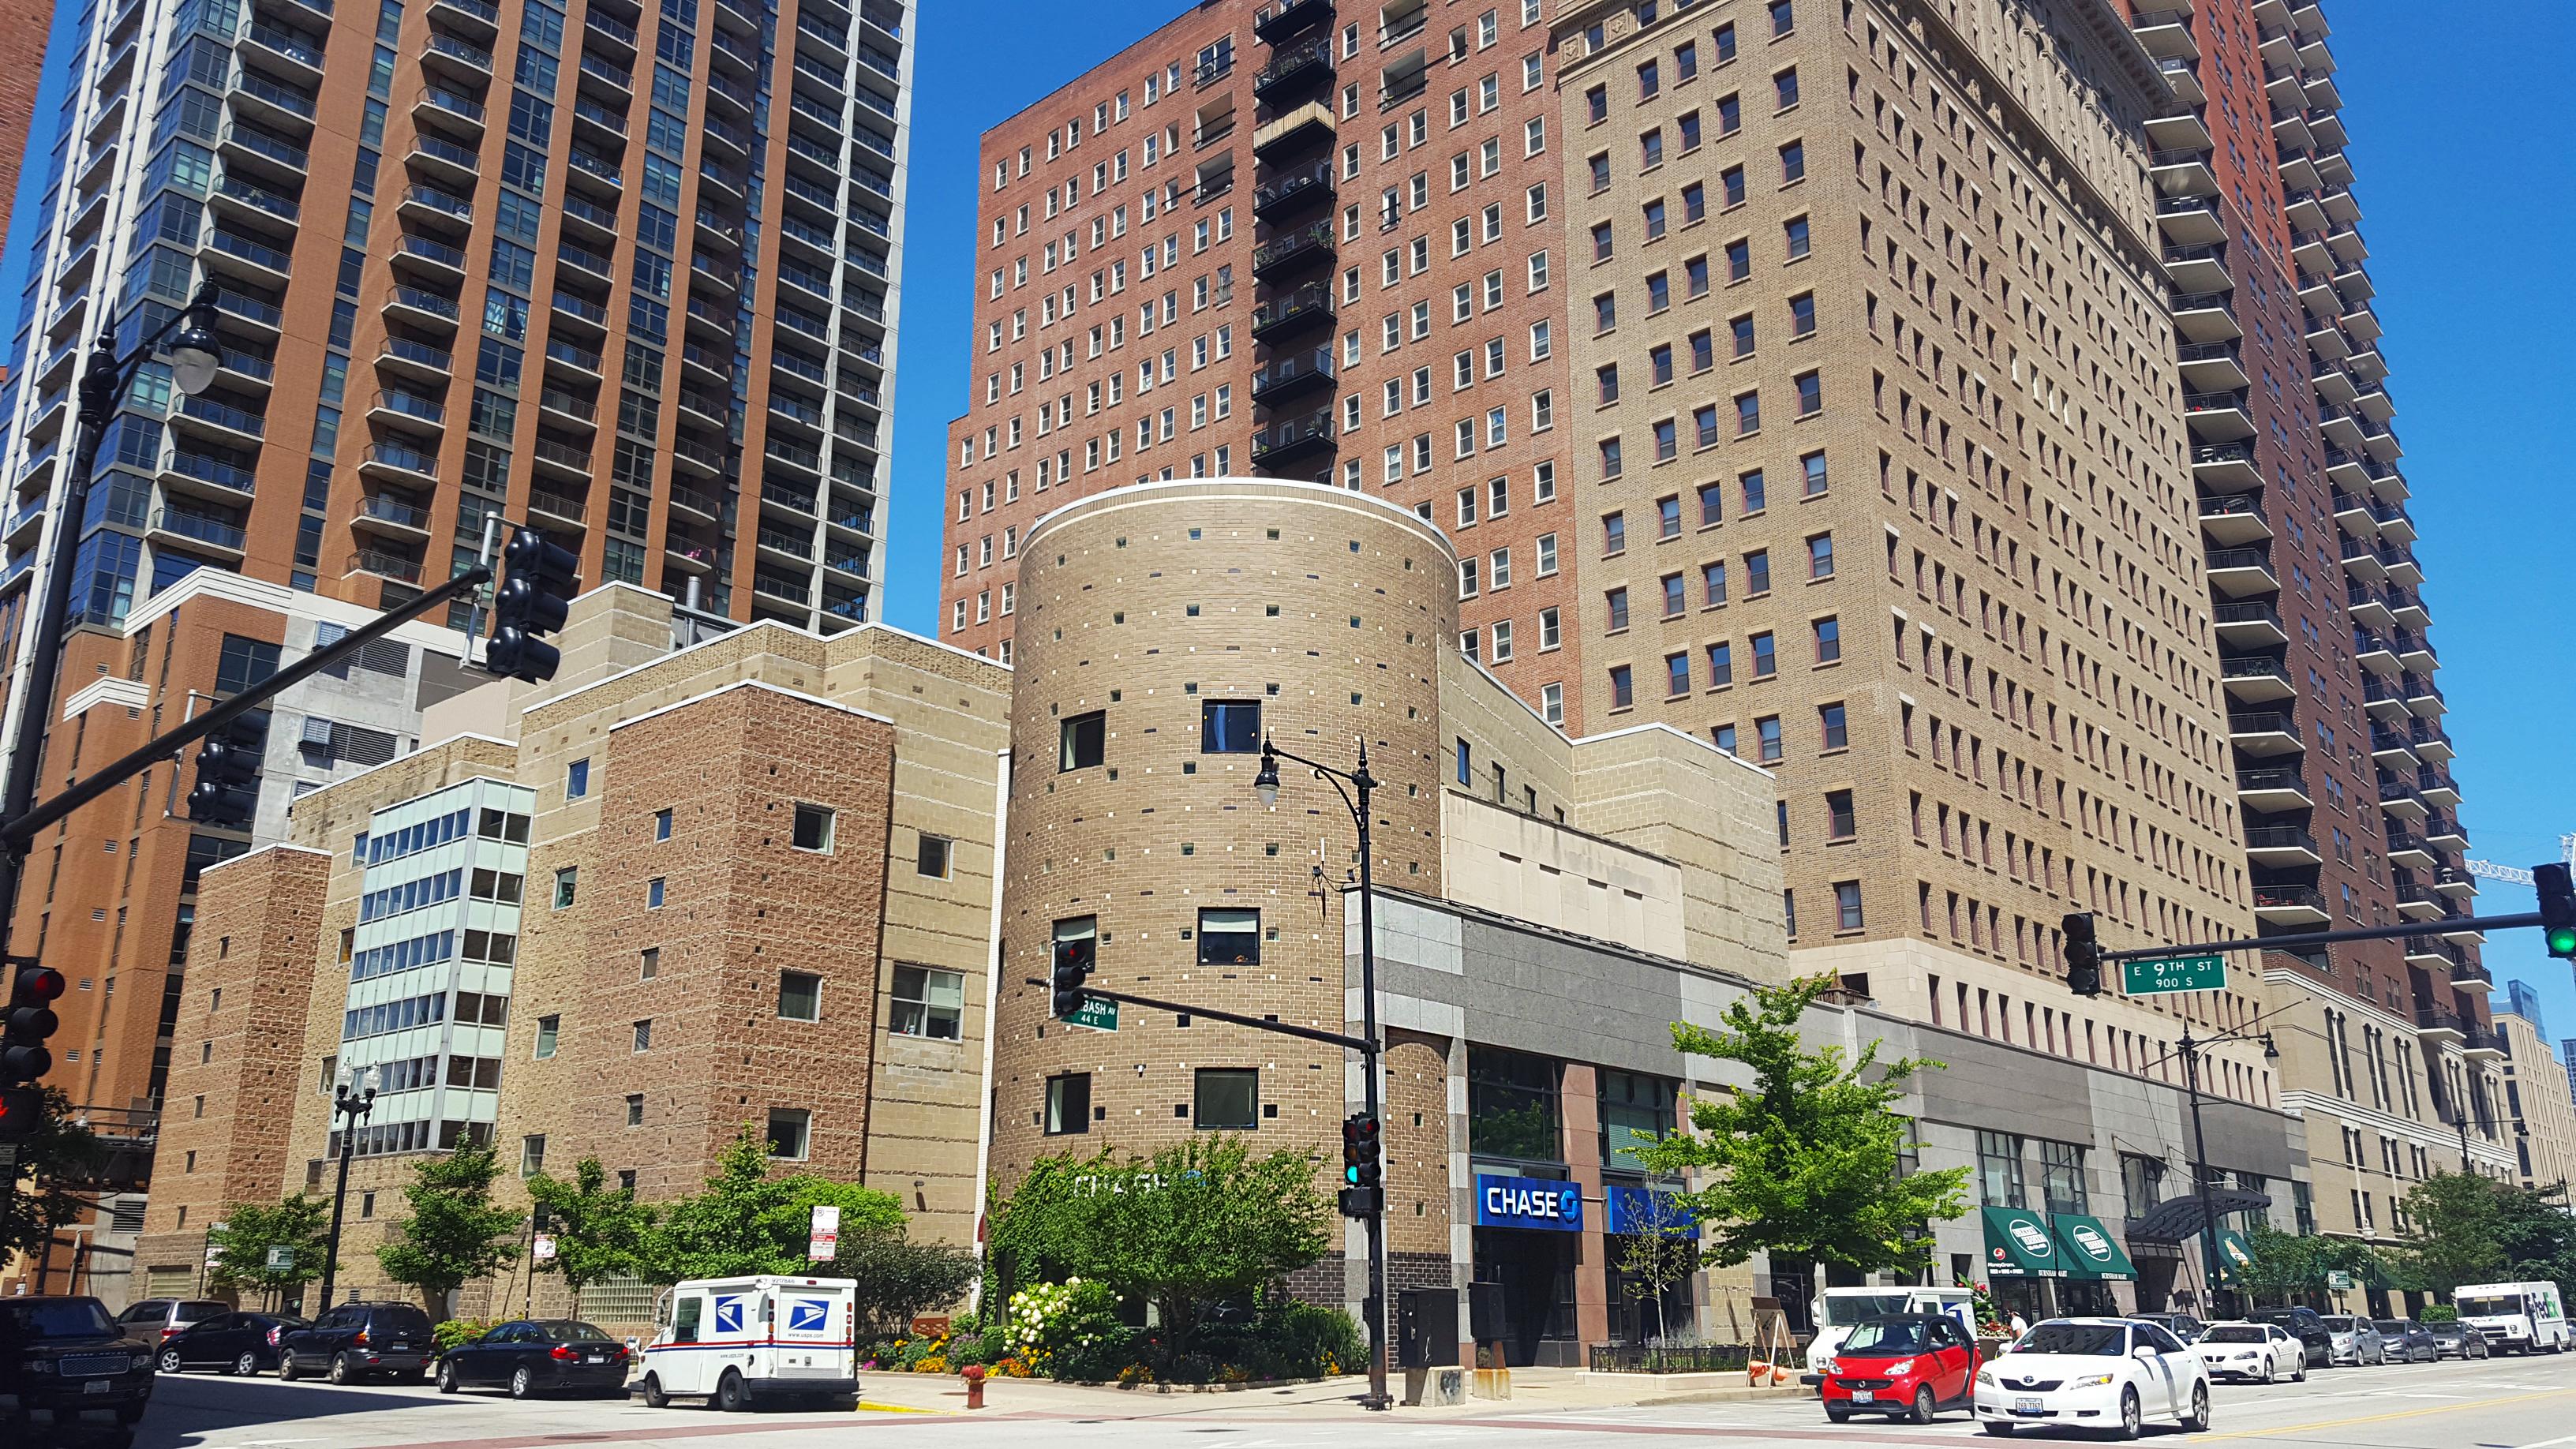 850 S Wabash building